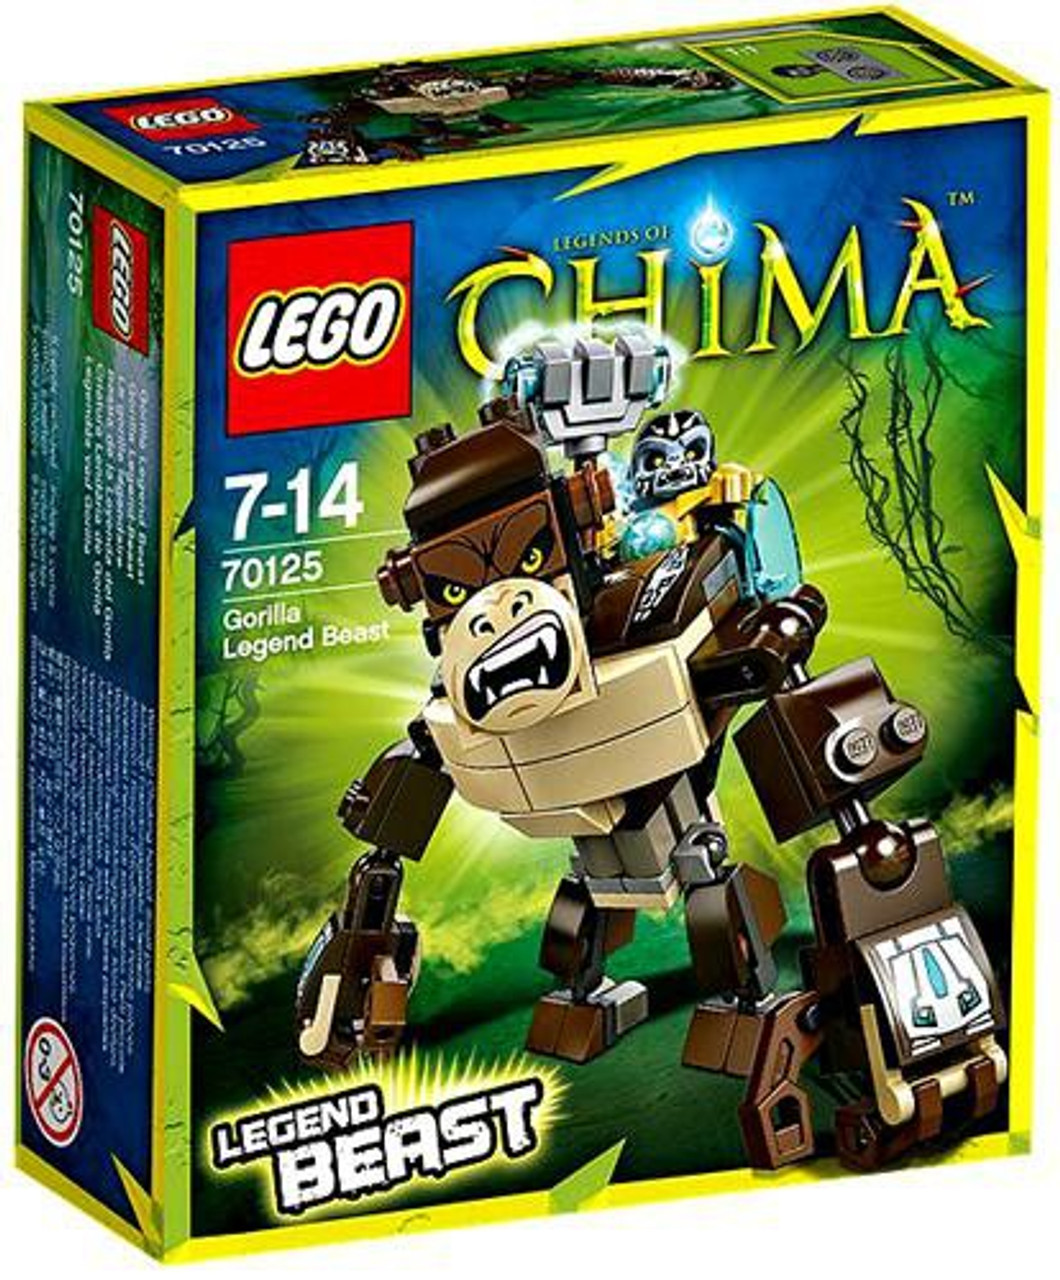 LEGO Legends of Chima Gorilla Legend Beast Set #70125